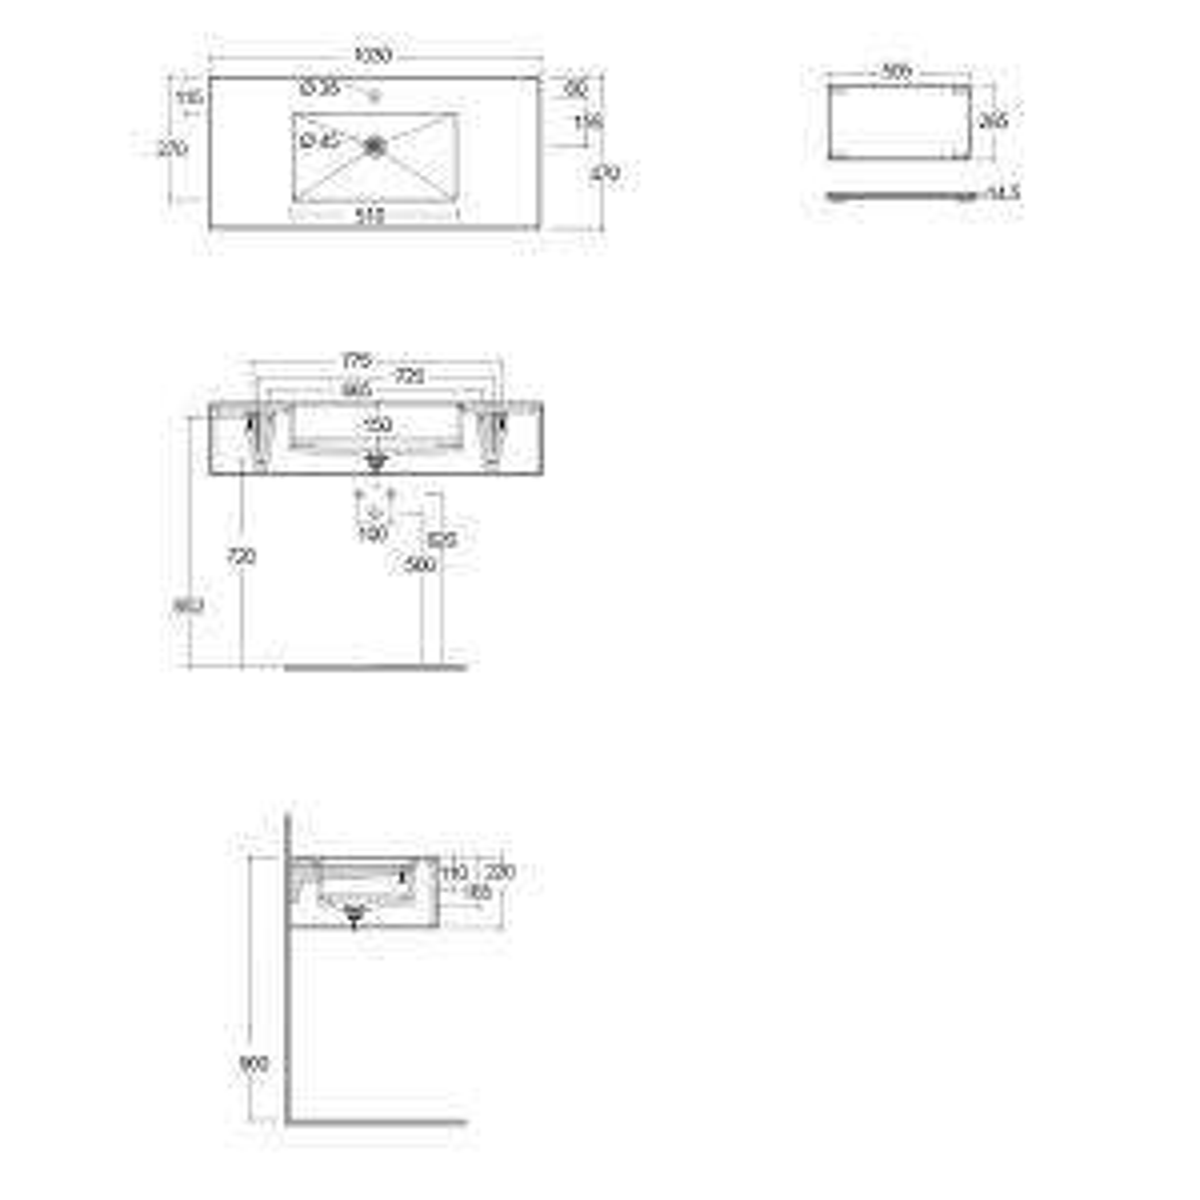 RAK Precious Travertino Ivory Wall Hung Counter Basin 1000mm with Brackets Measurements